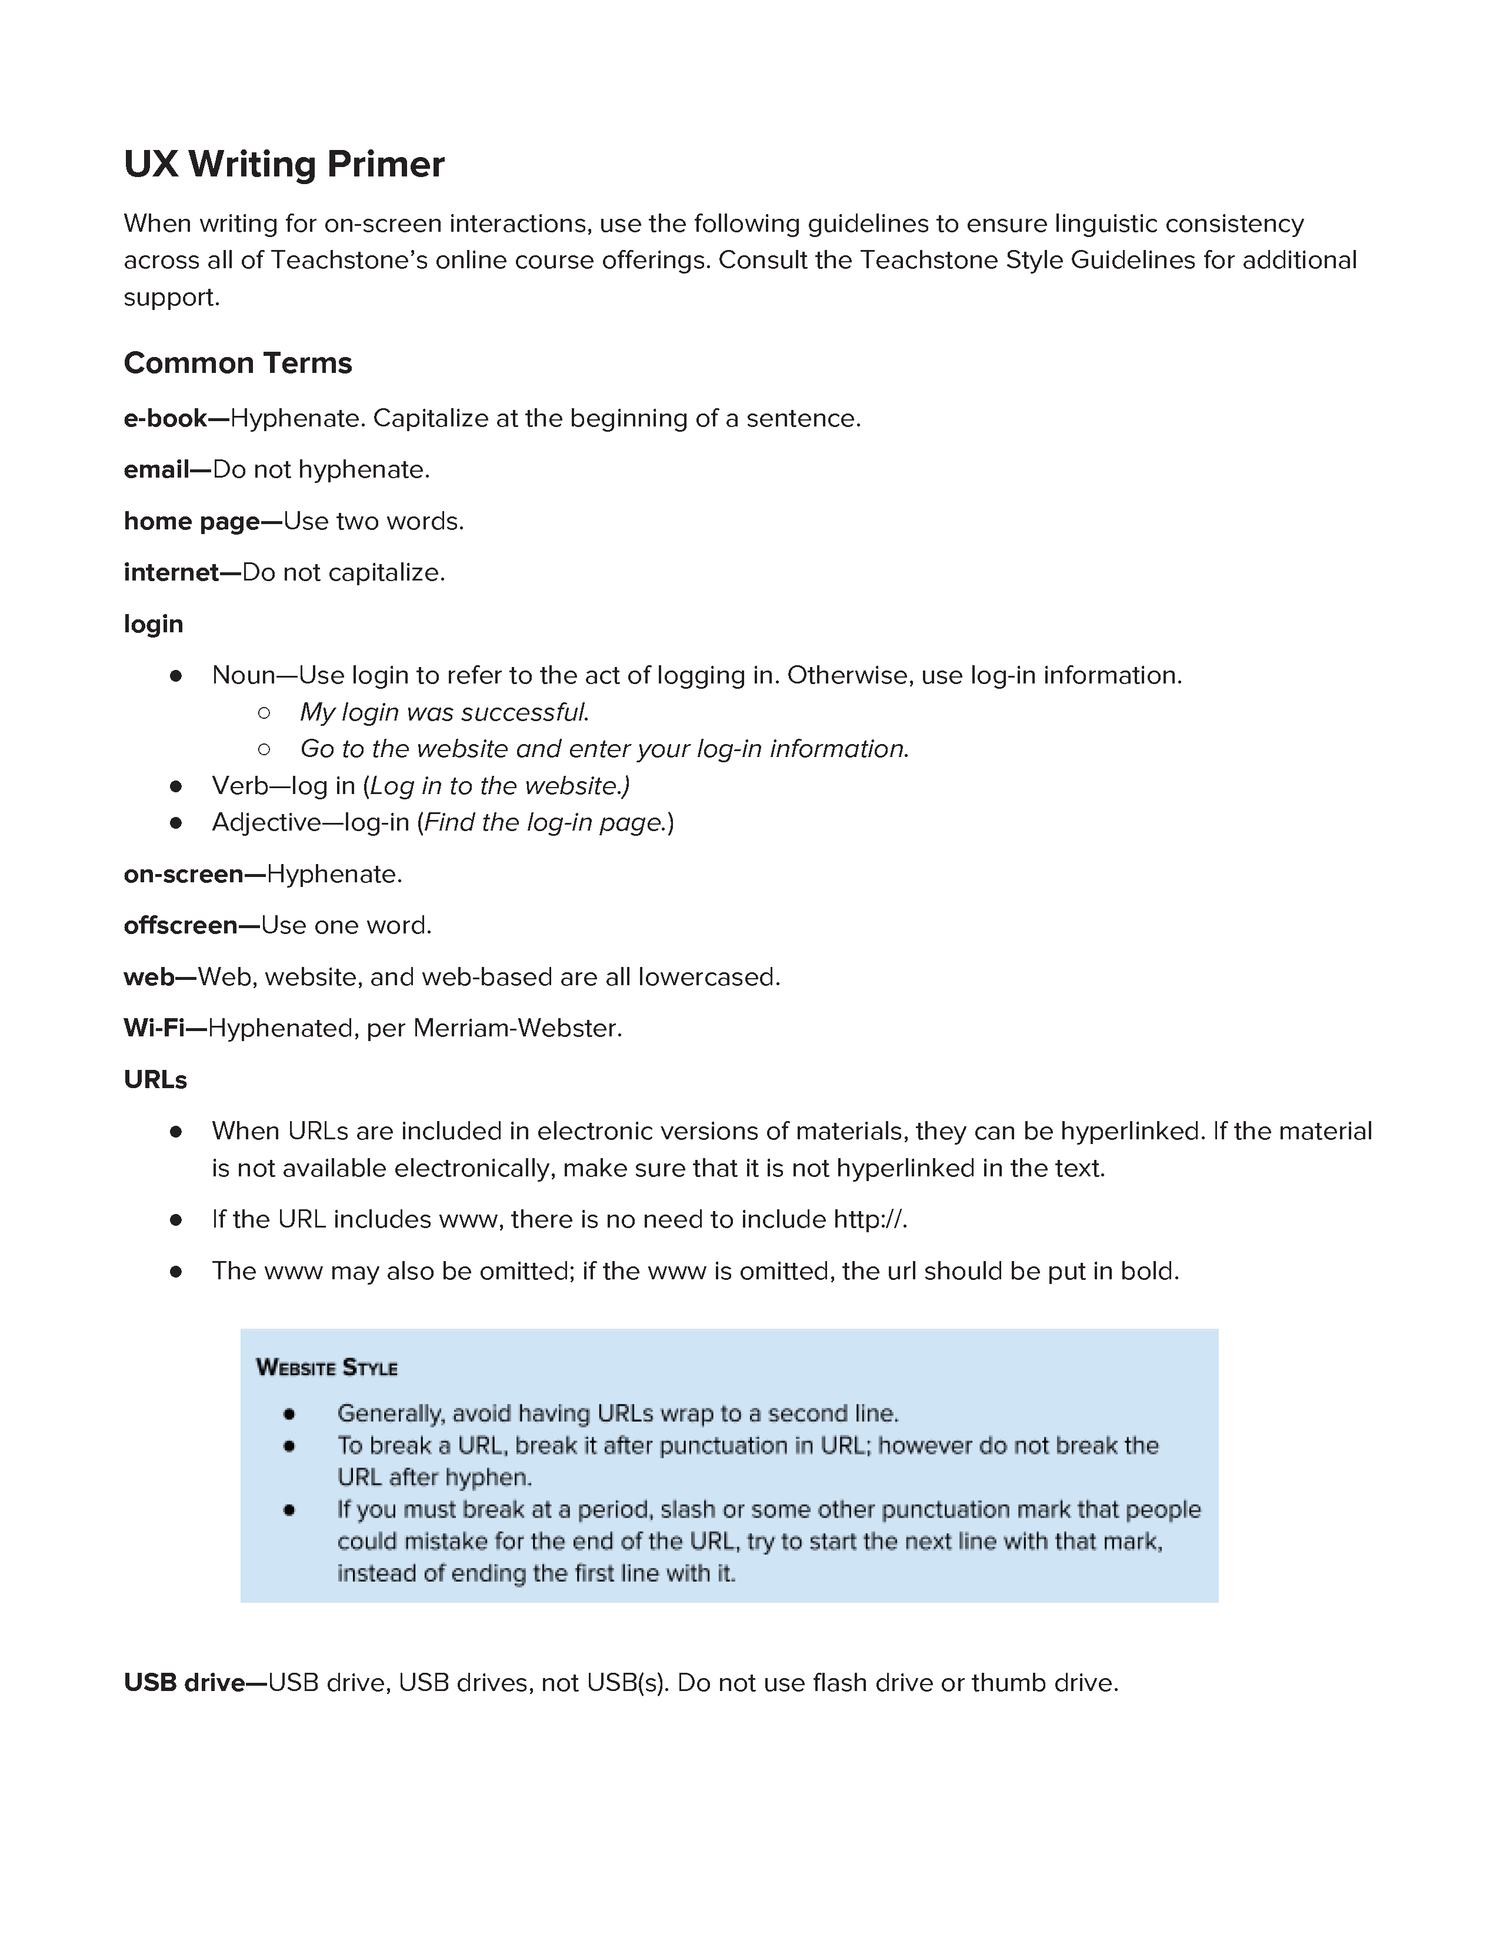 UX Writing & Editing